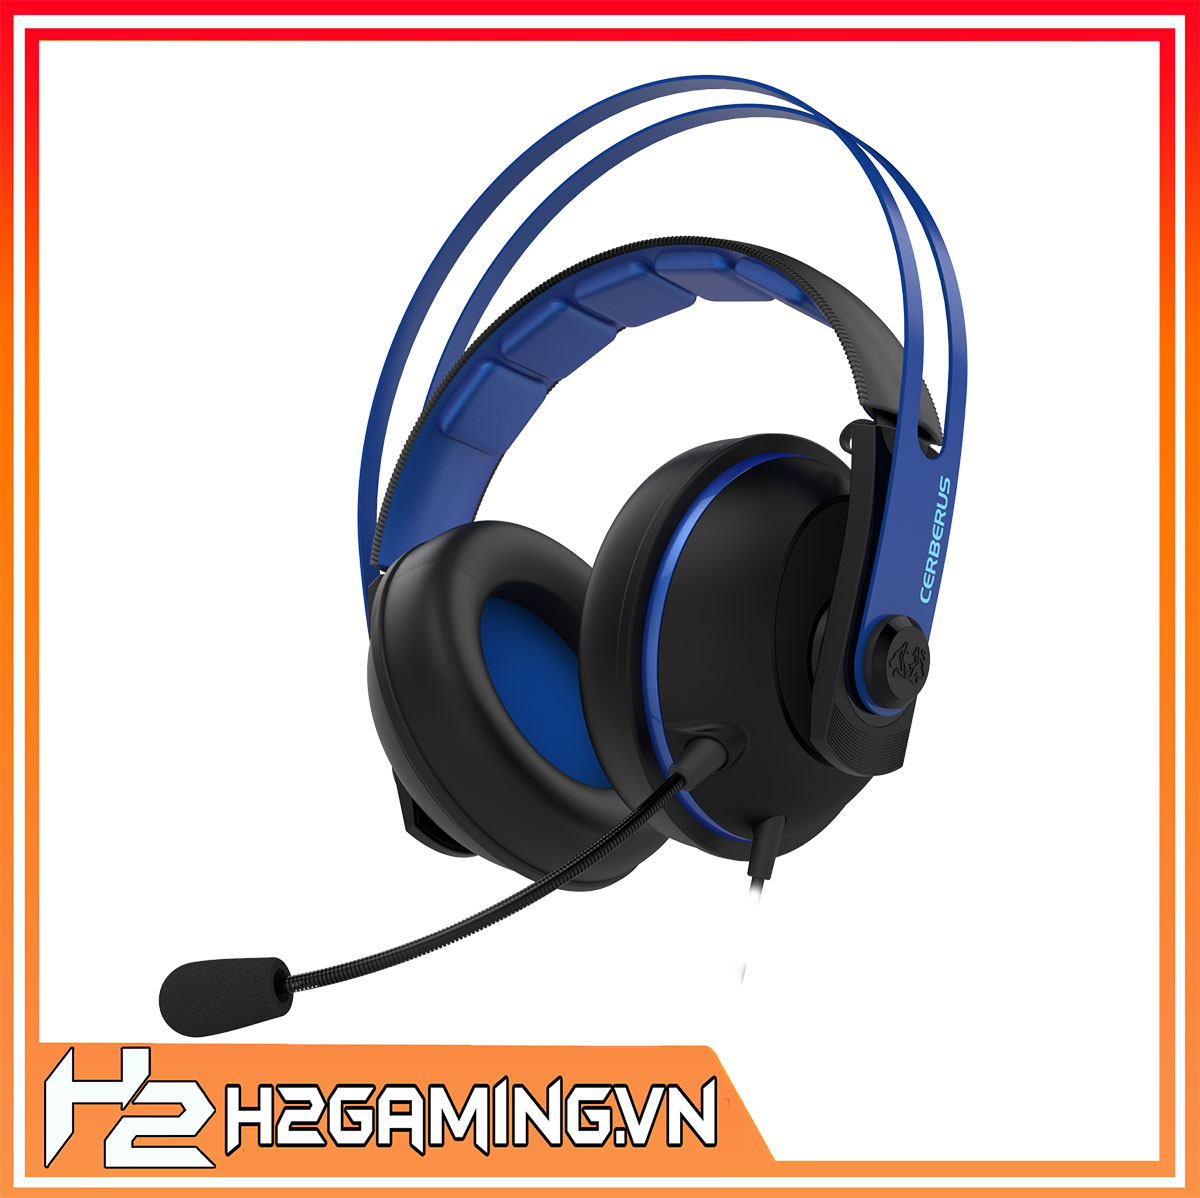 Headset_Cerberus_V2_Blue